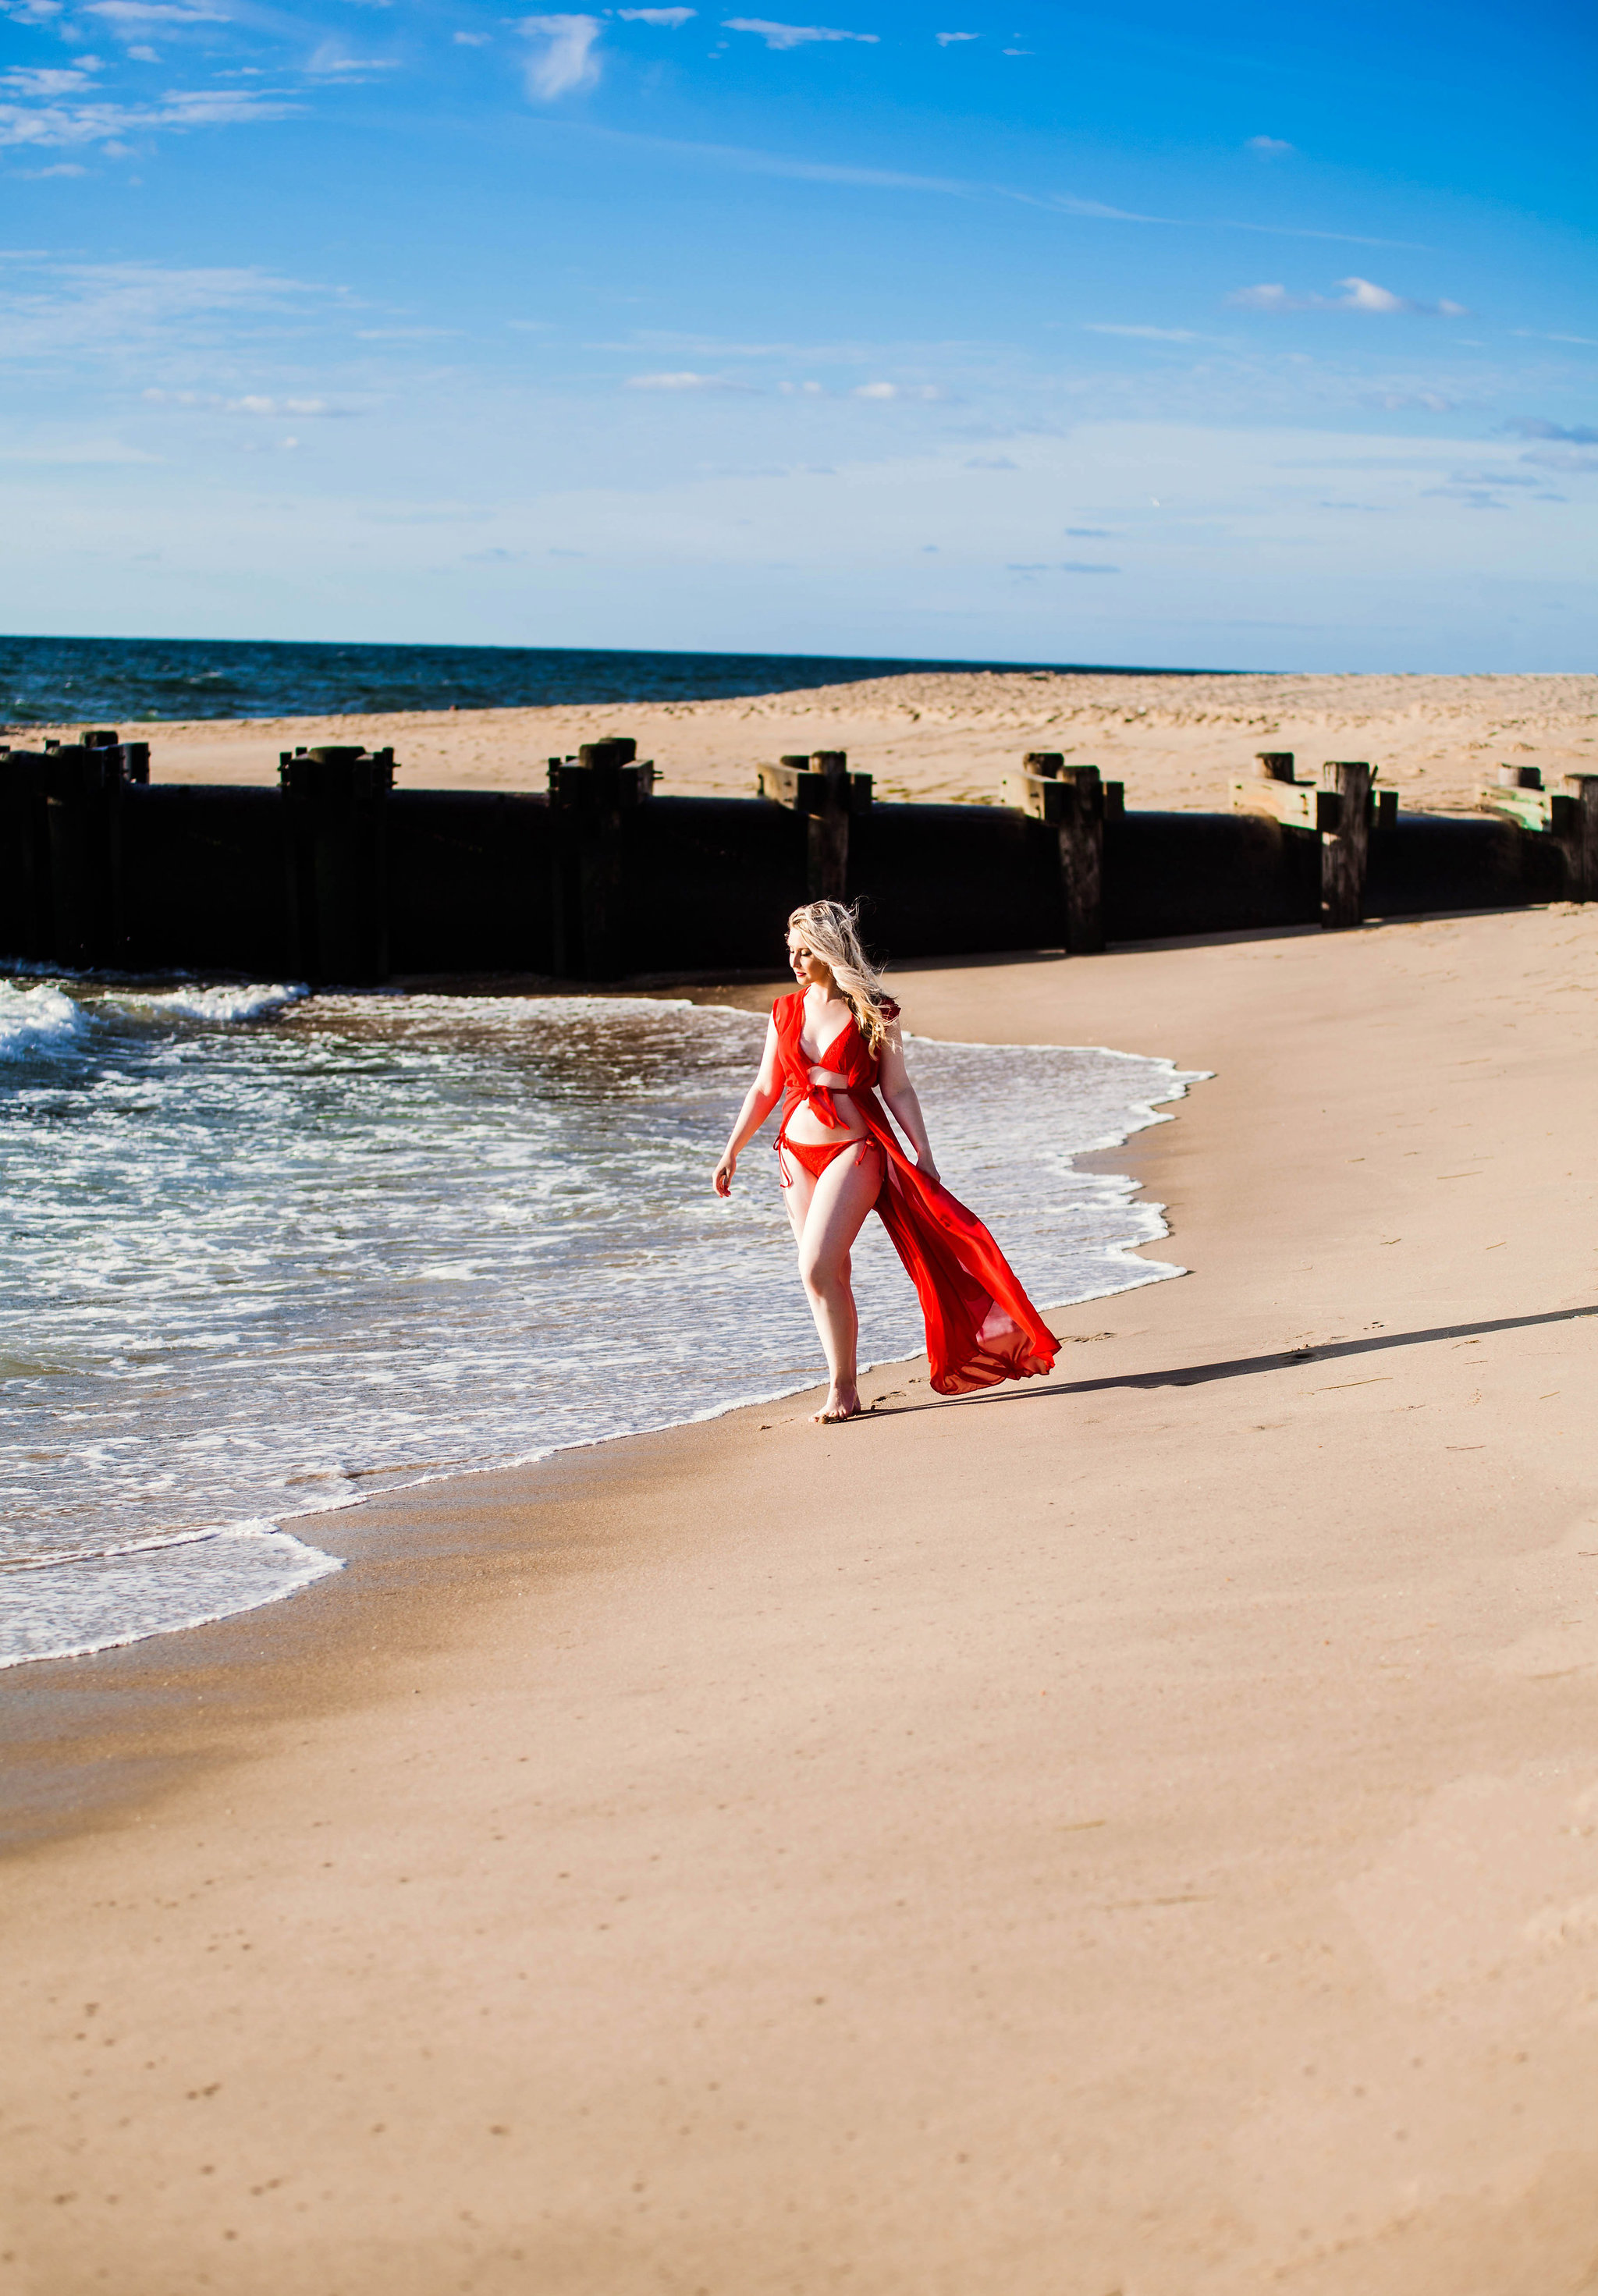 Alli_Sunrise_Beach_LongBranch-2833_pp.jpg